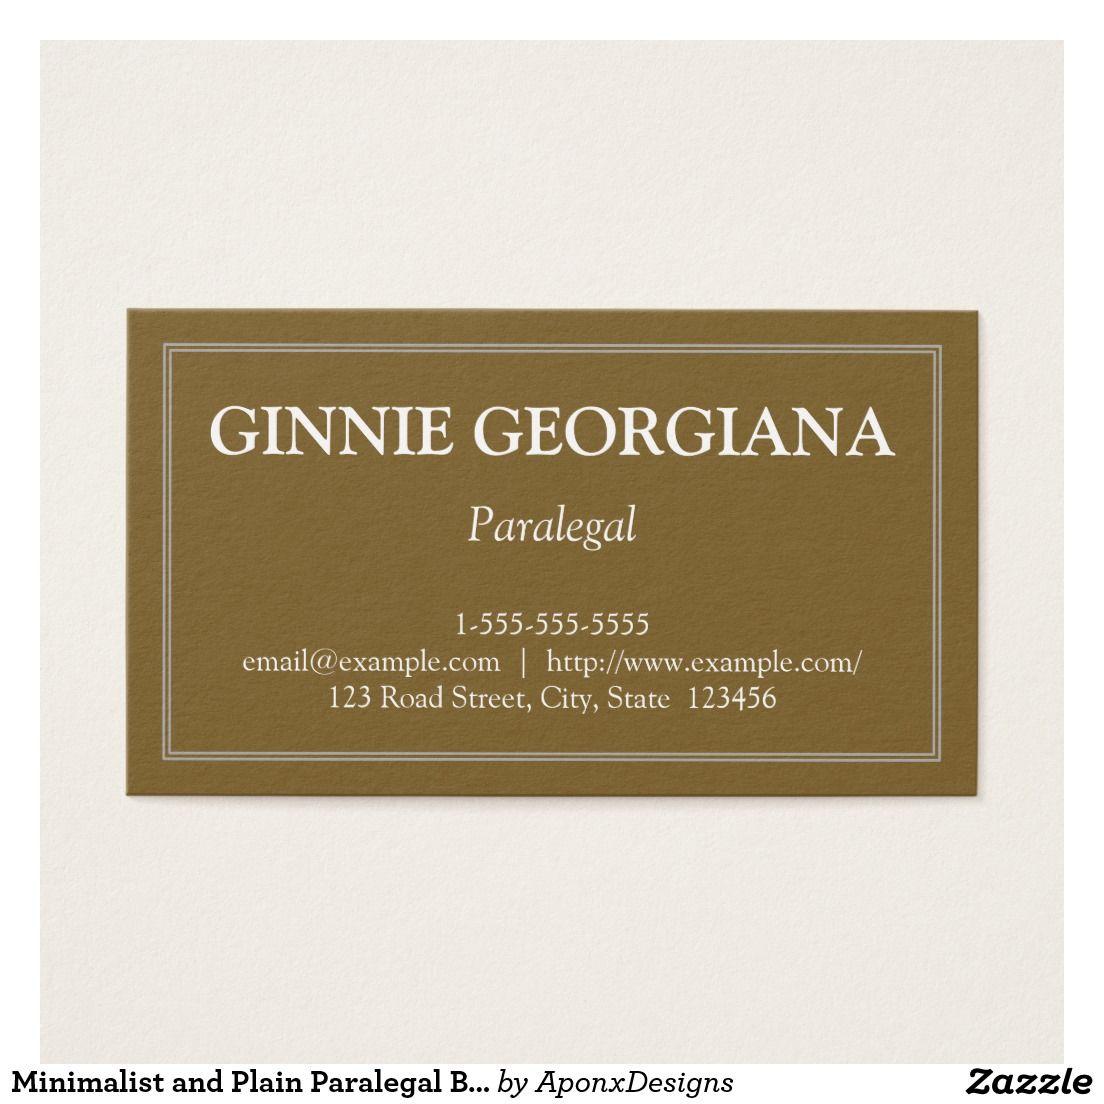 Minimalist and plain paralegal business card paralegal business minimalist and plain paralegal business card reheart Choice Image